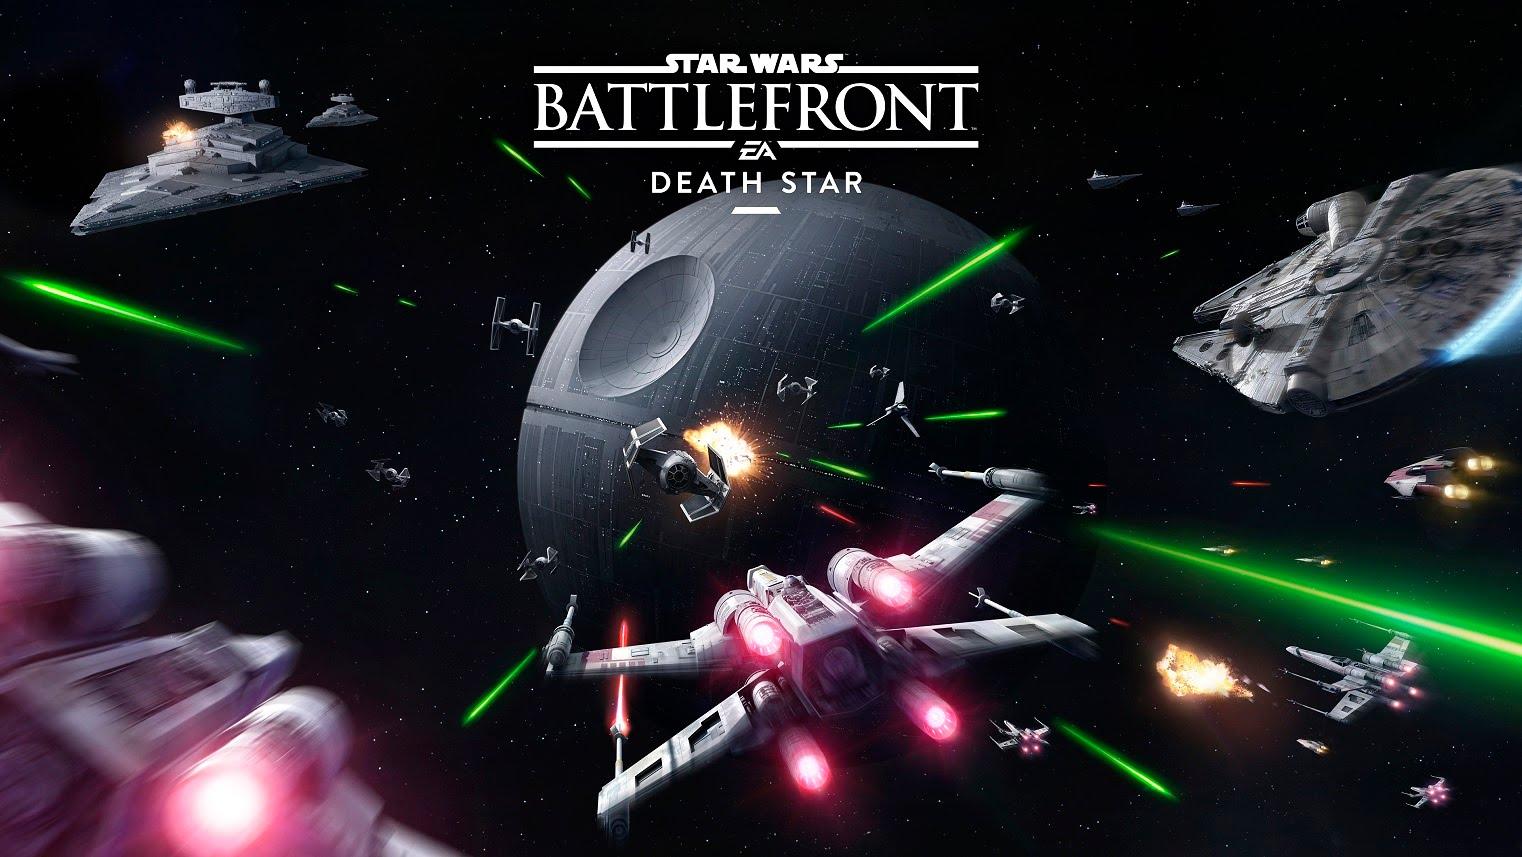 deathstarps4